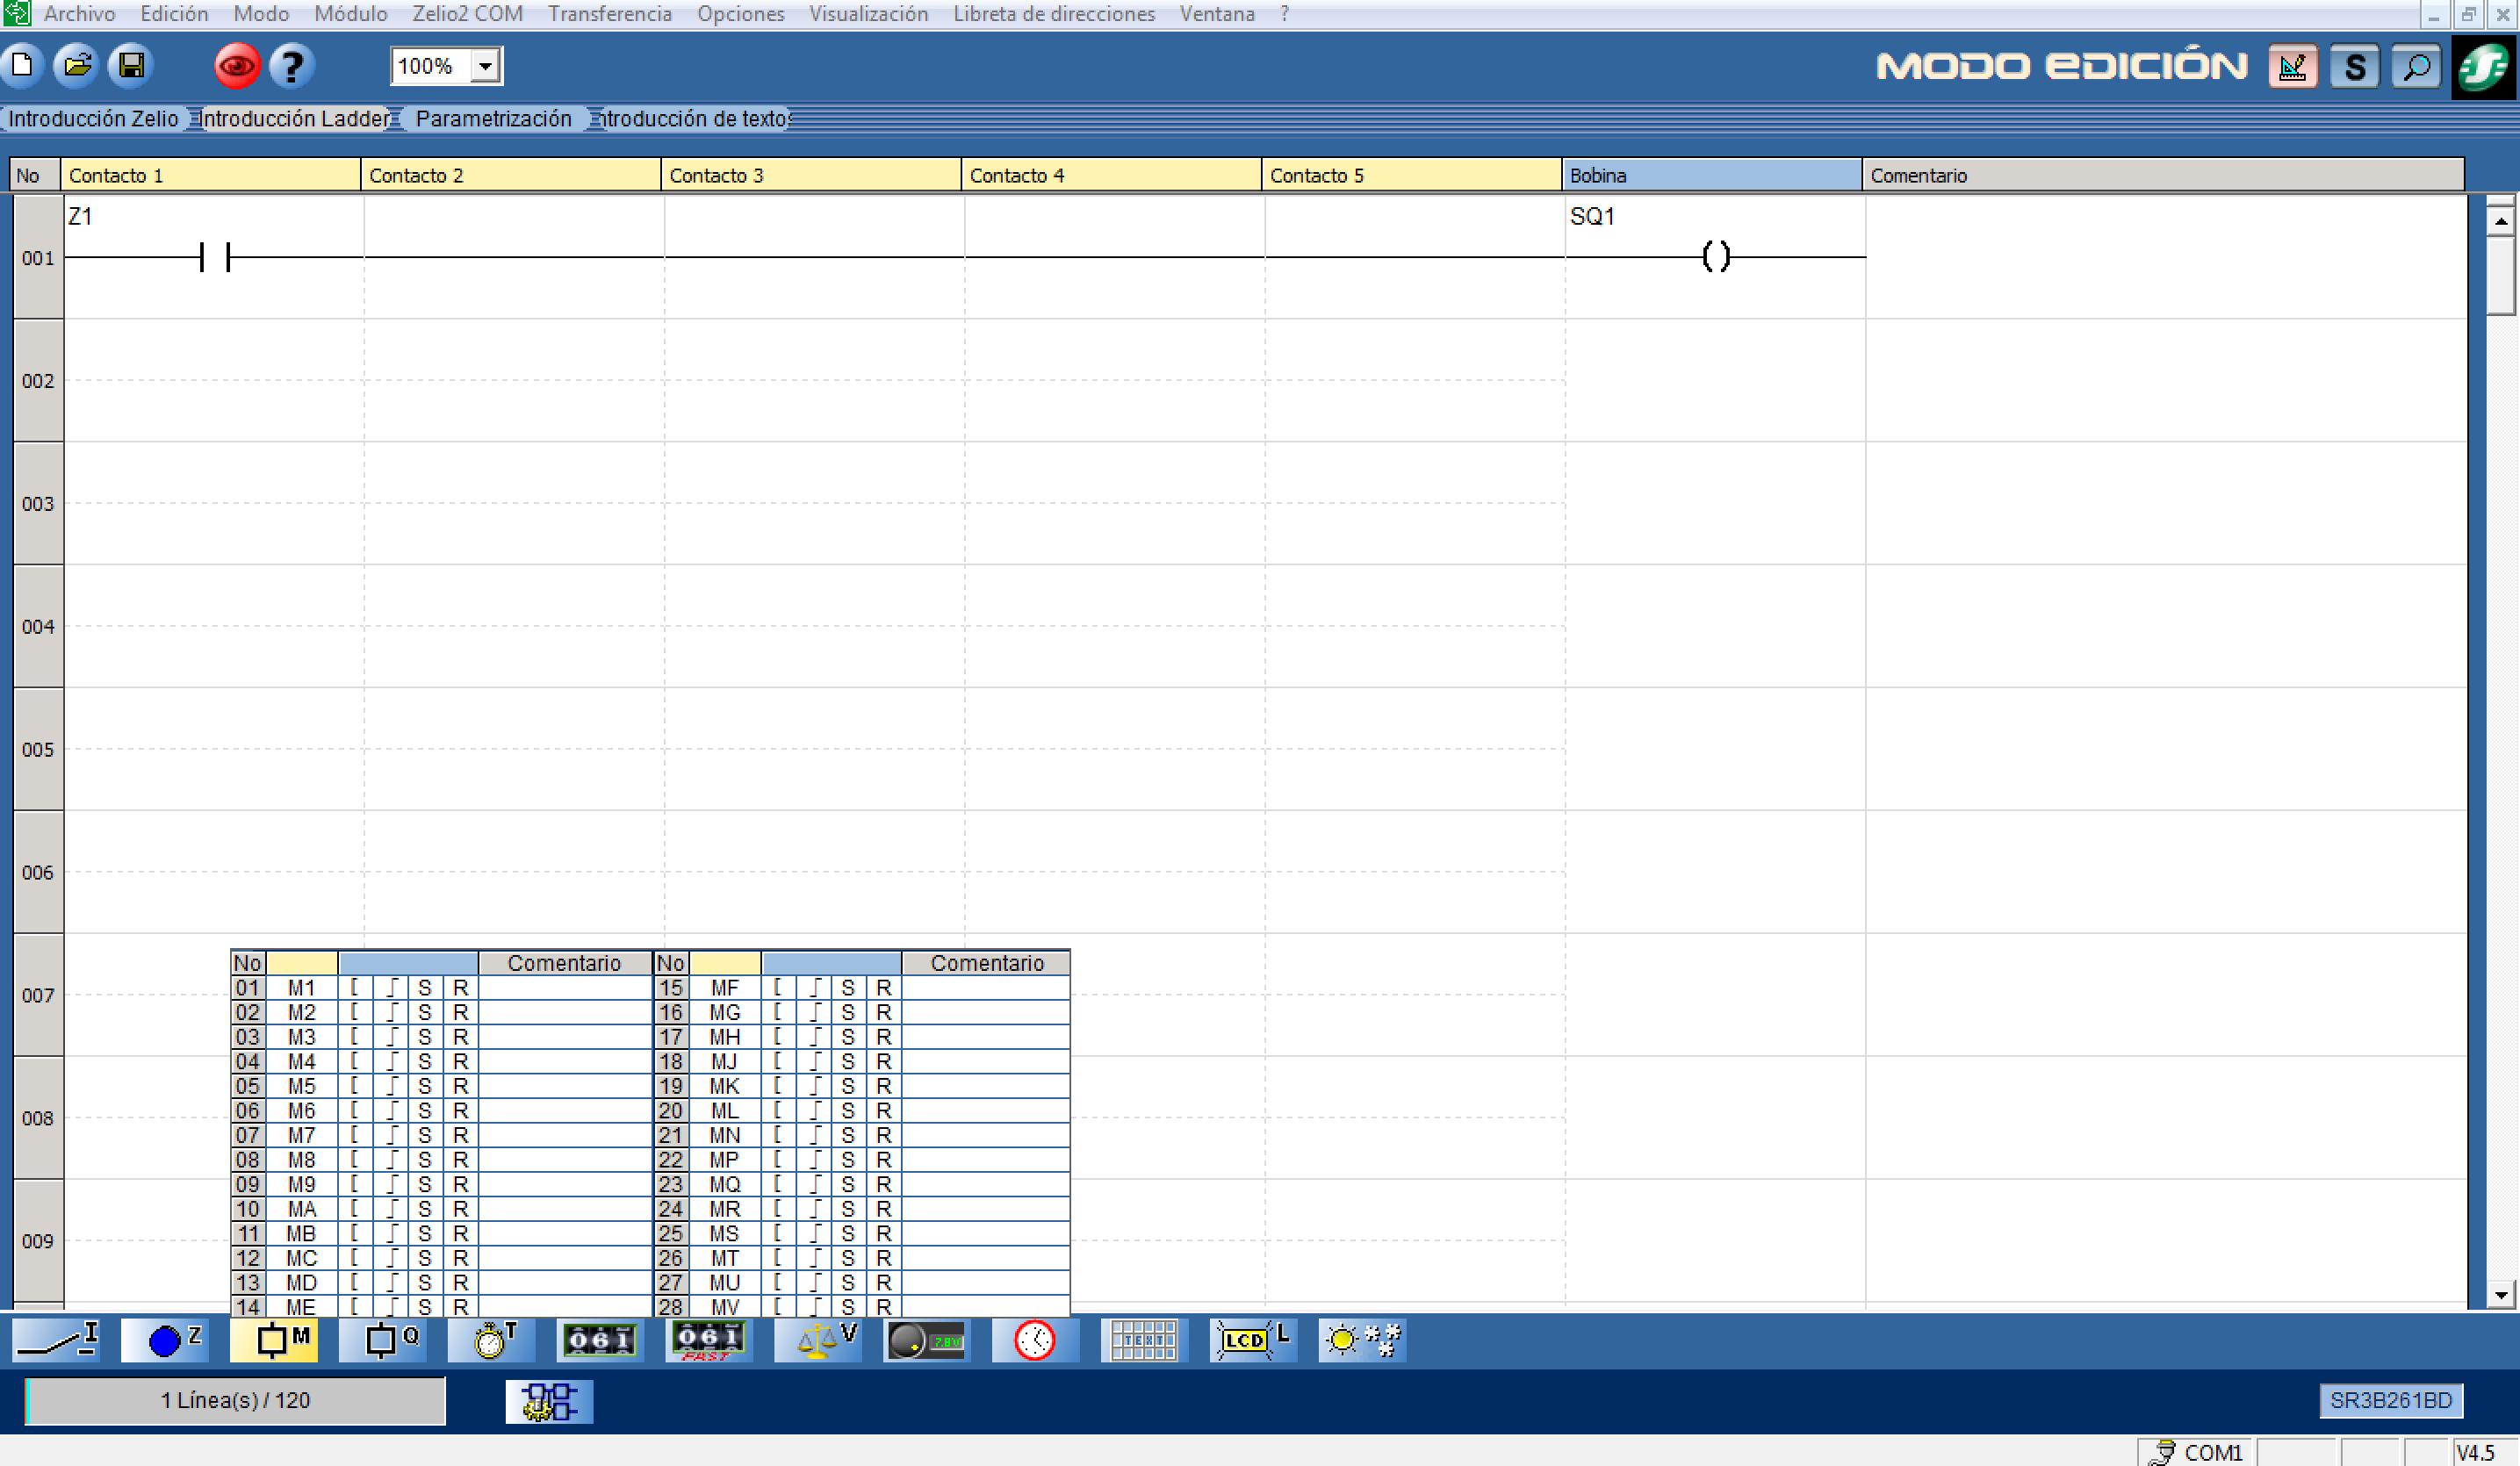 Opciones disponibles en zelio soft2 en lenguaje ladder